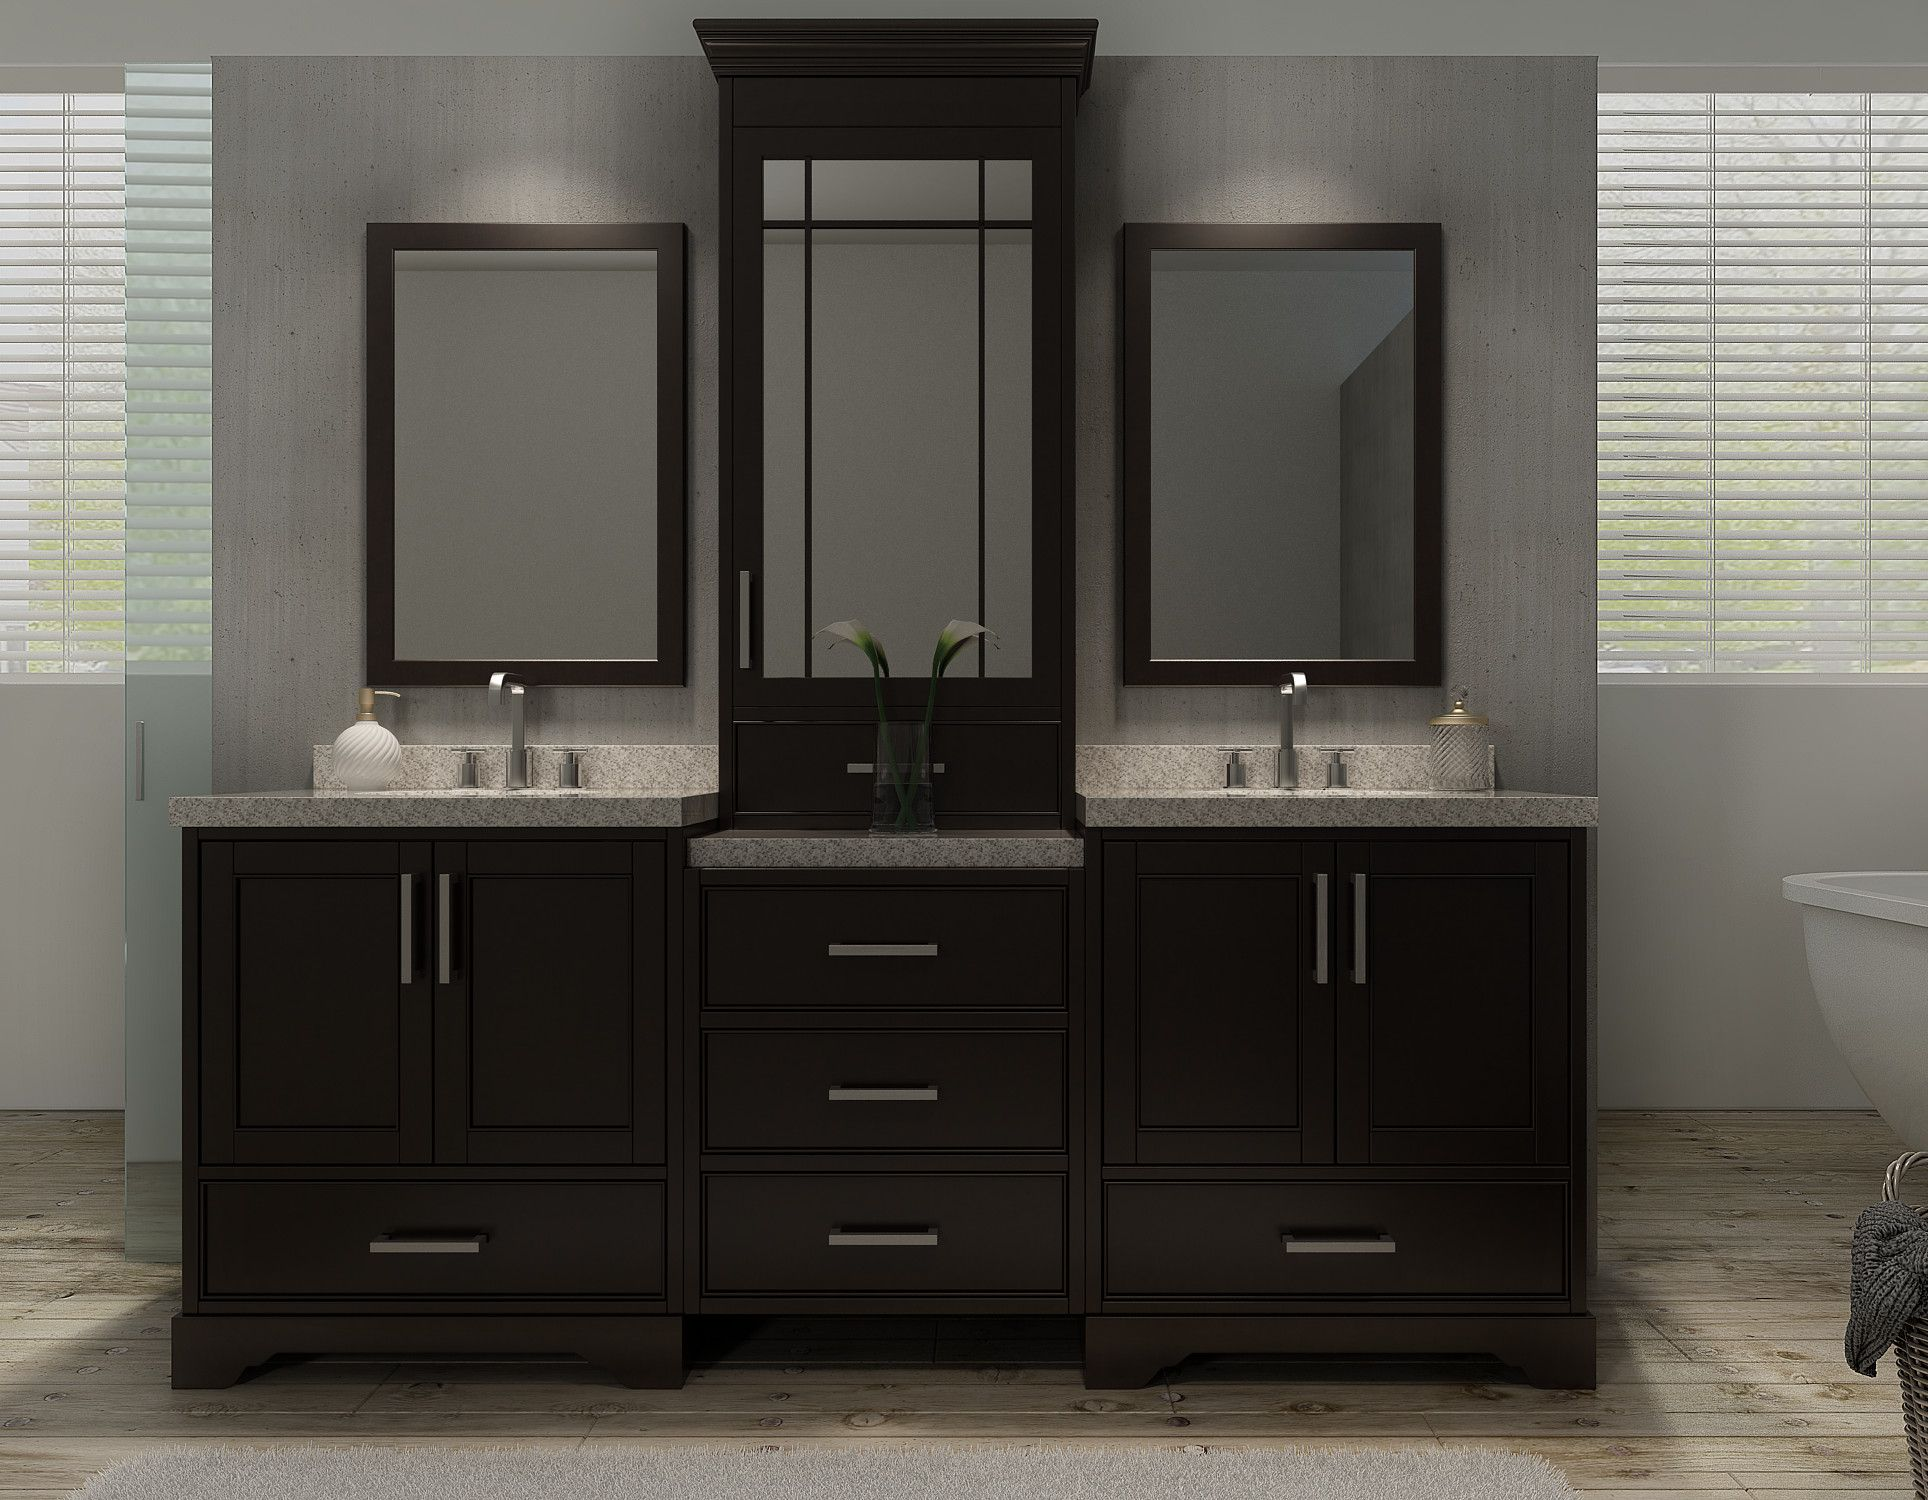 Master Bathroom With Images Double Vanity Bathroom Double